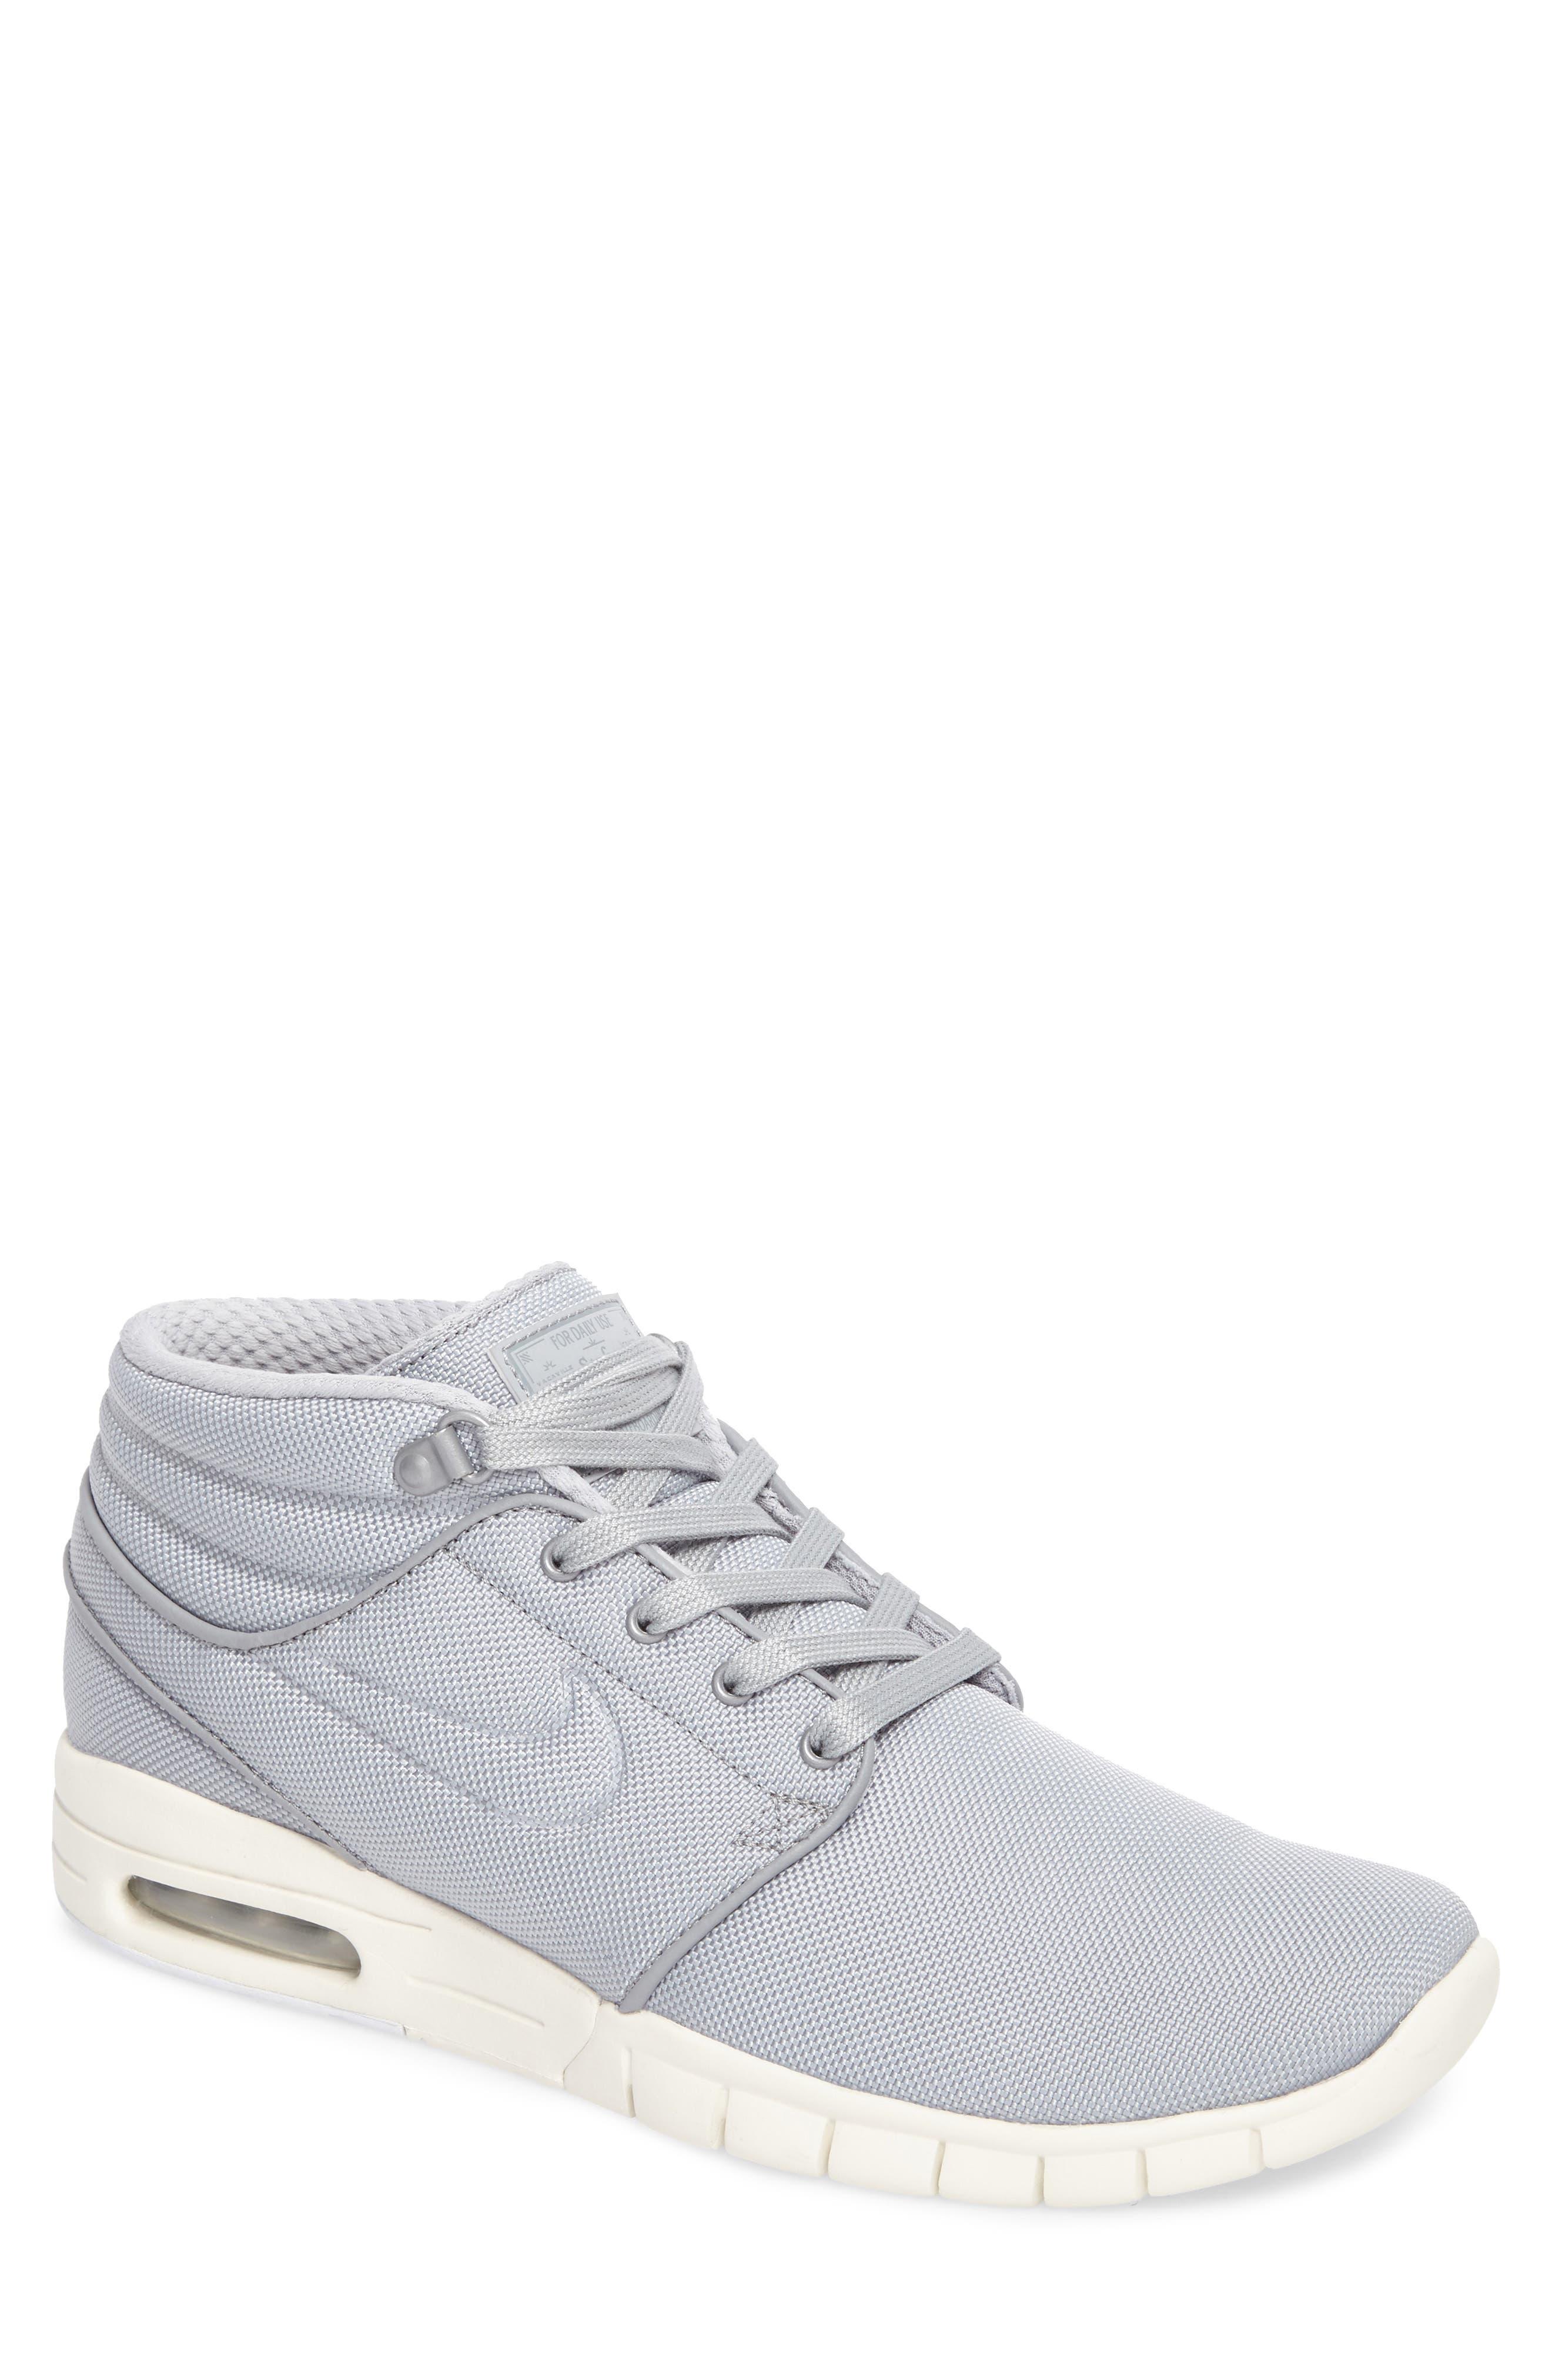 SB Stefan Janoski Max Mid Skate Shoe,                         Main,                         color, Wolf Grey/ Wolf Grey-Cool Grey